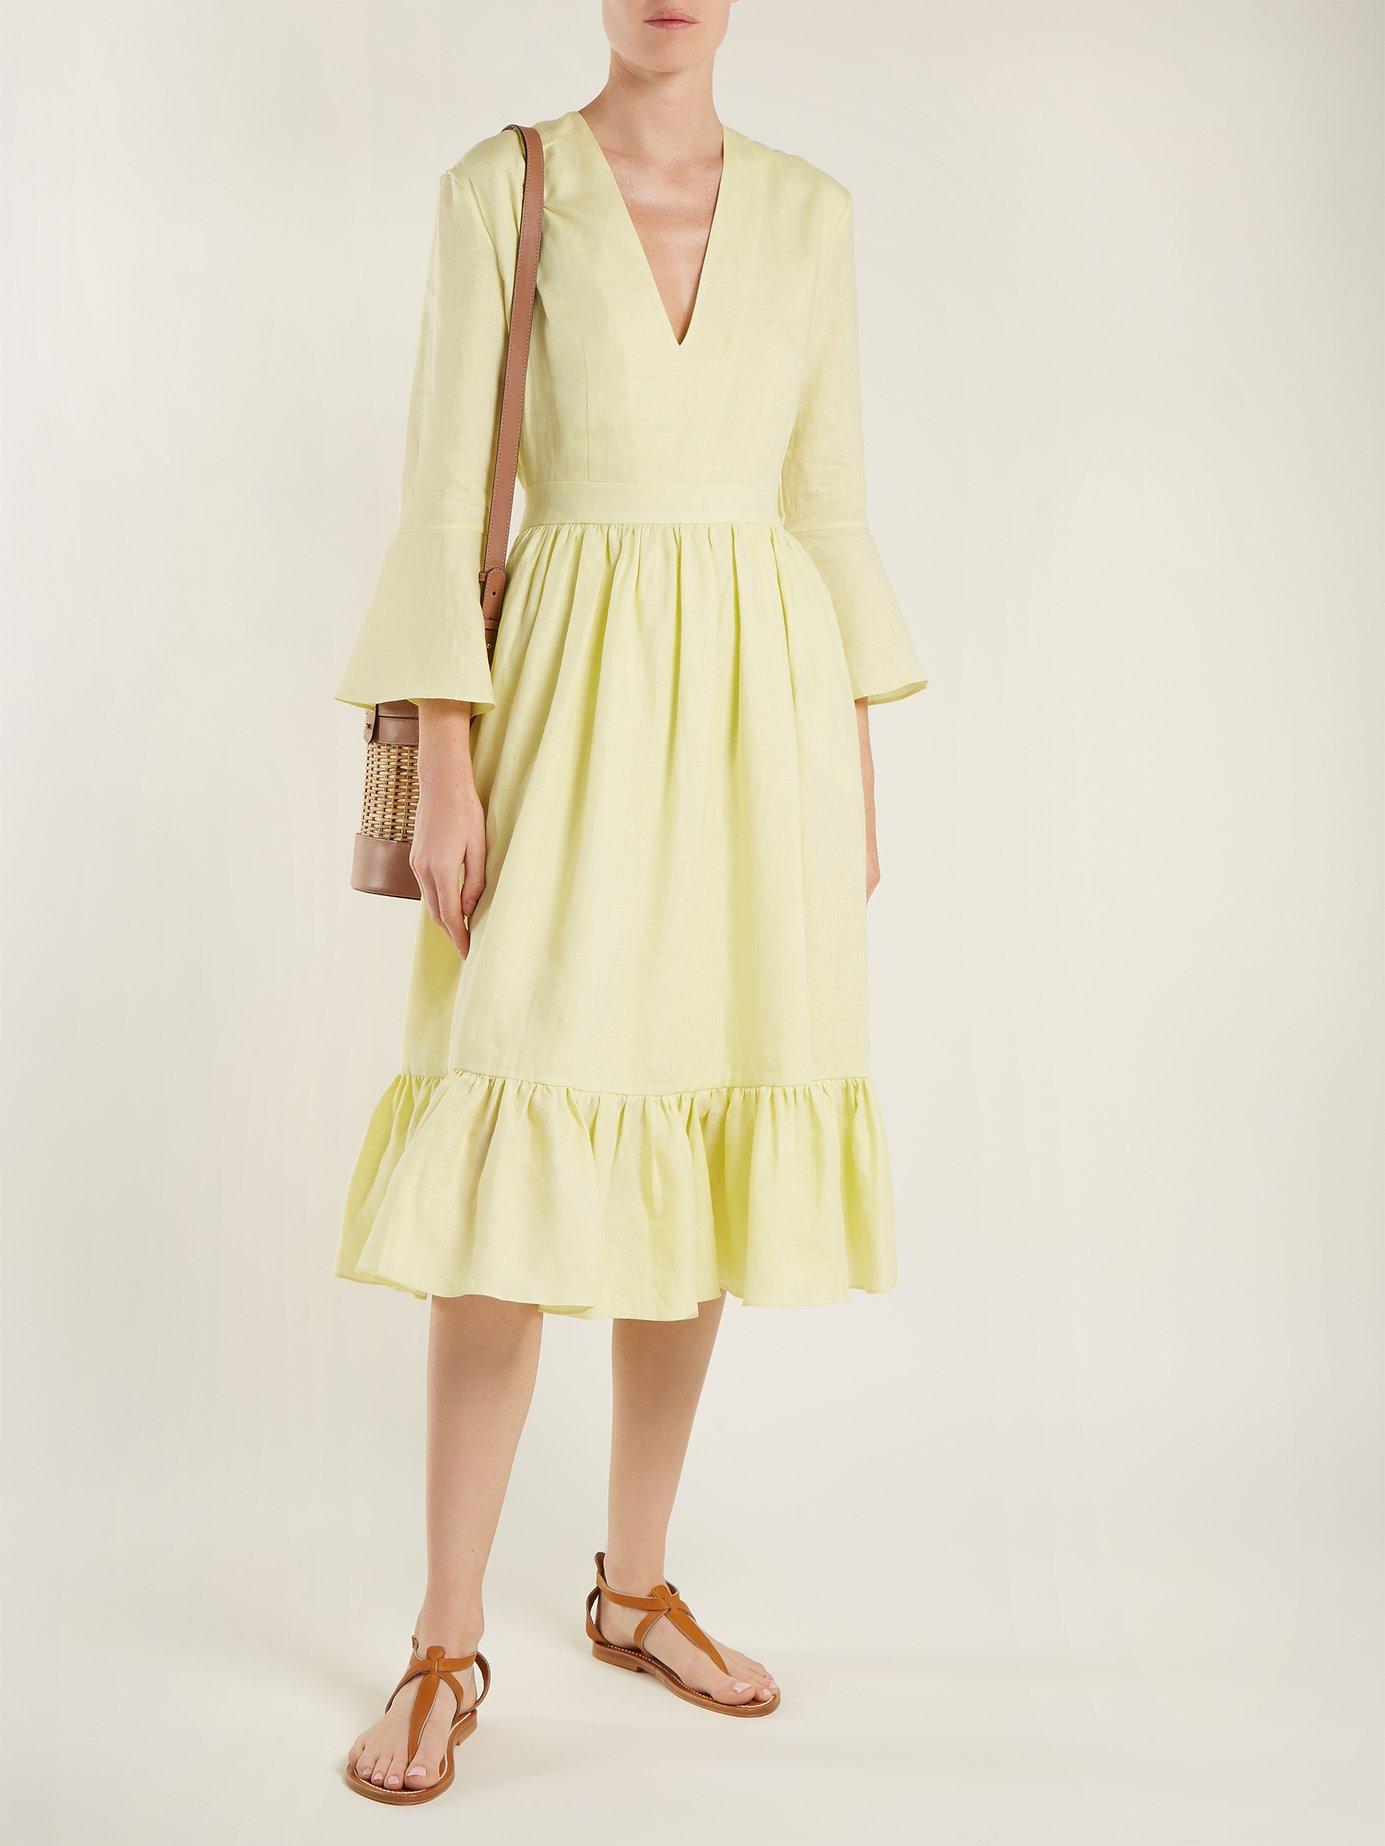 Sea Island linen midi dress by Loup Charmant